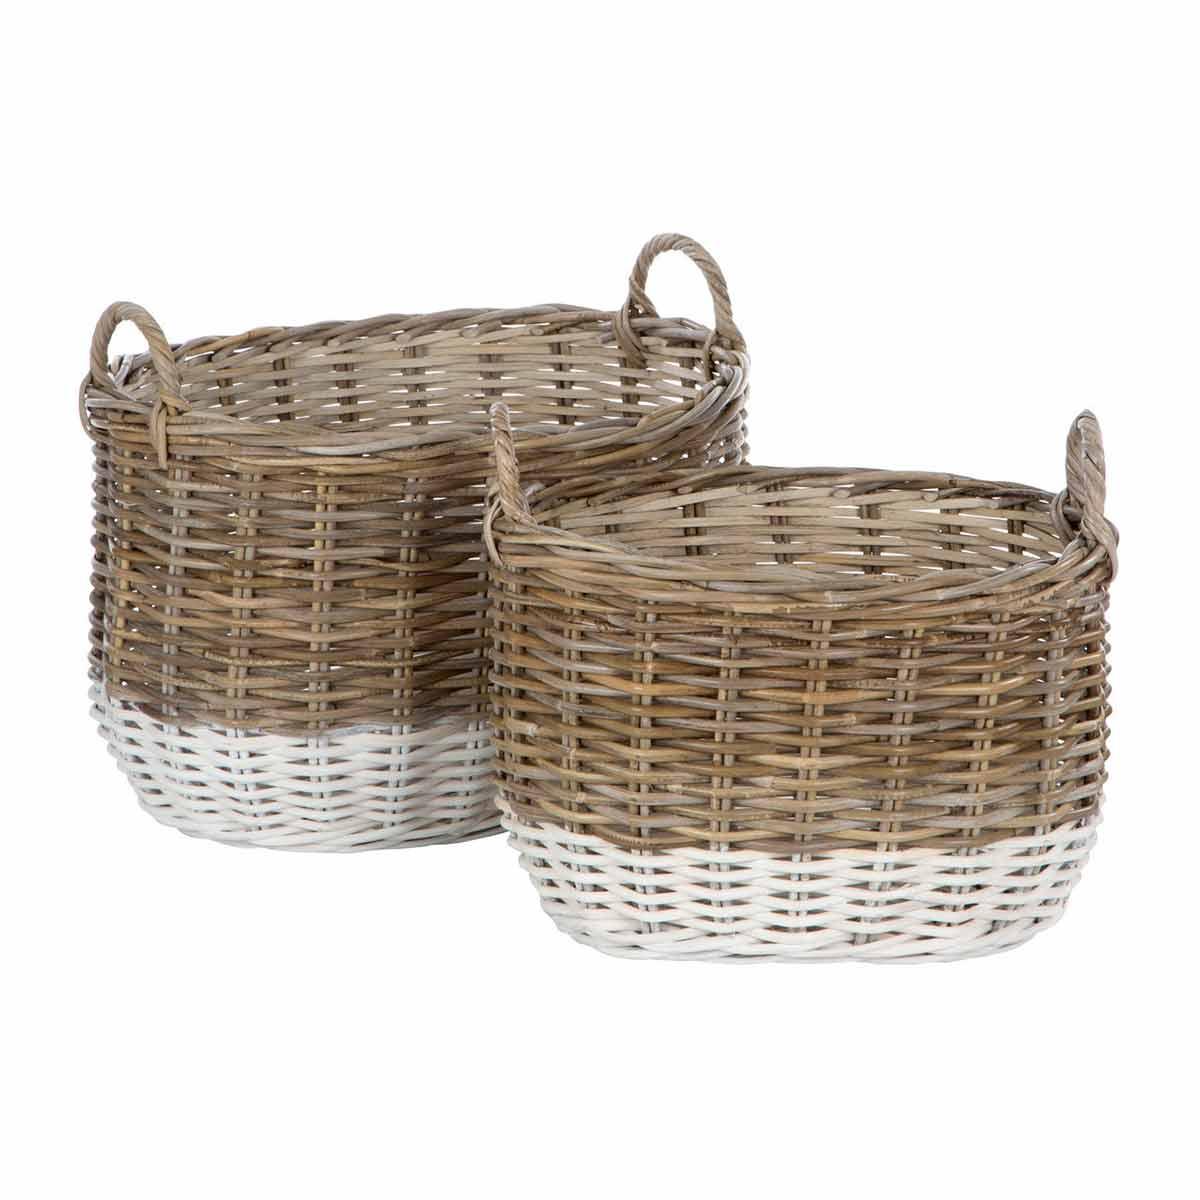 Hampstead Oval Storage Baskets Set of 2